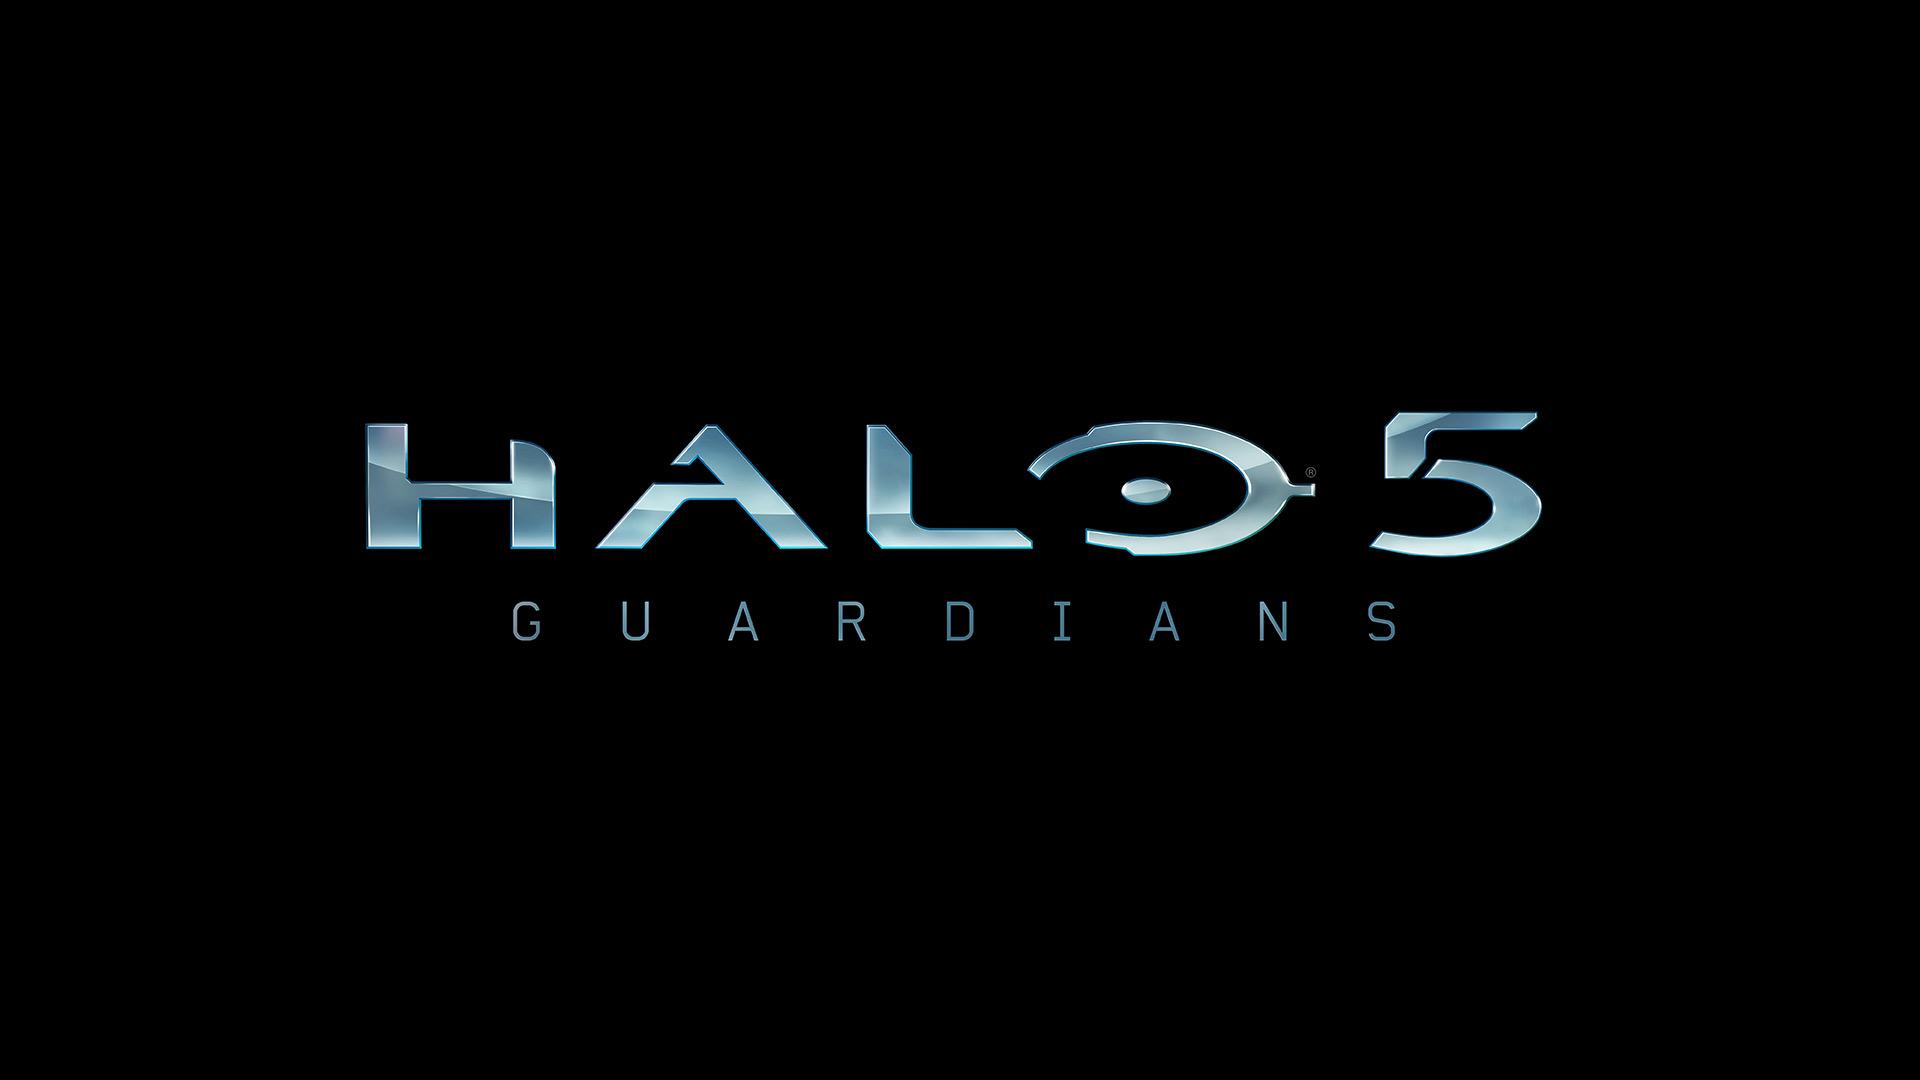 Halo 5 Guardians Wallpaper: Halo 5 Guardians Wallpaper